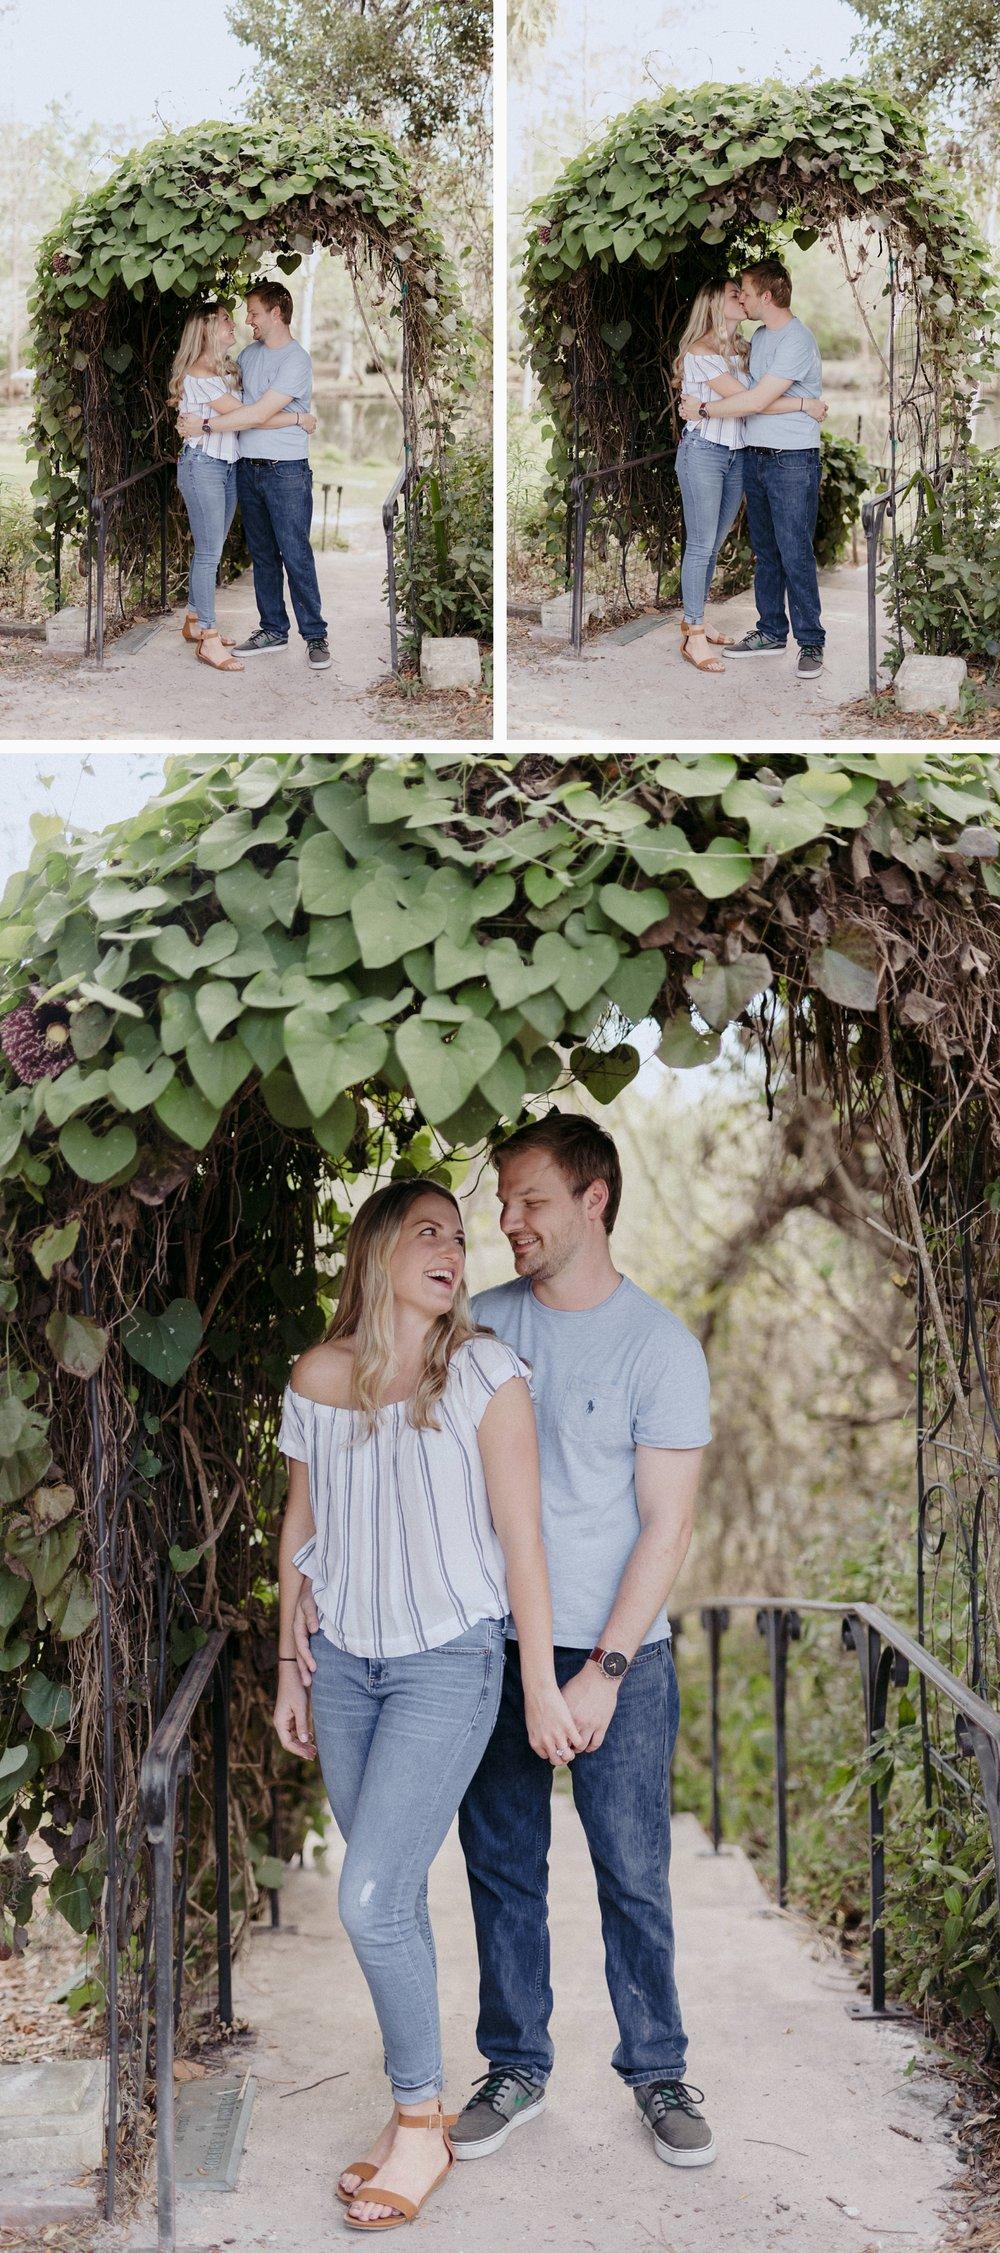 Kylie-And-Jack-Mead-Botanical-Garden-Engagement_0002.jpg